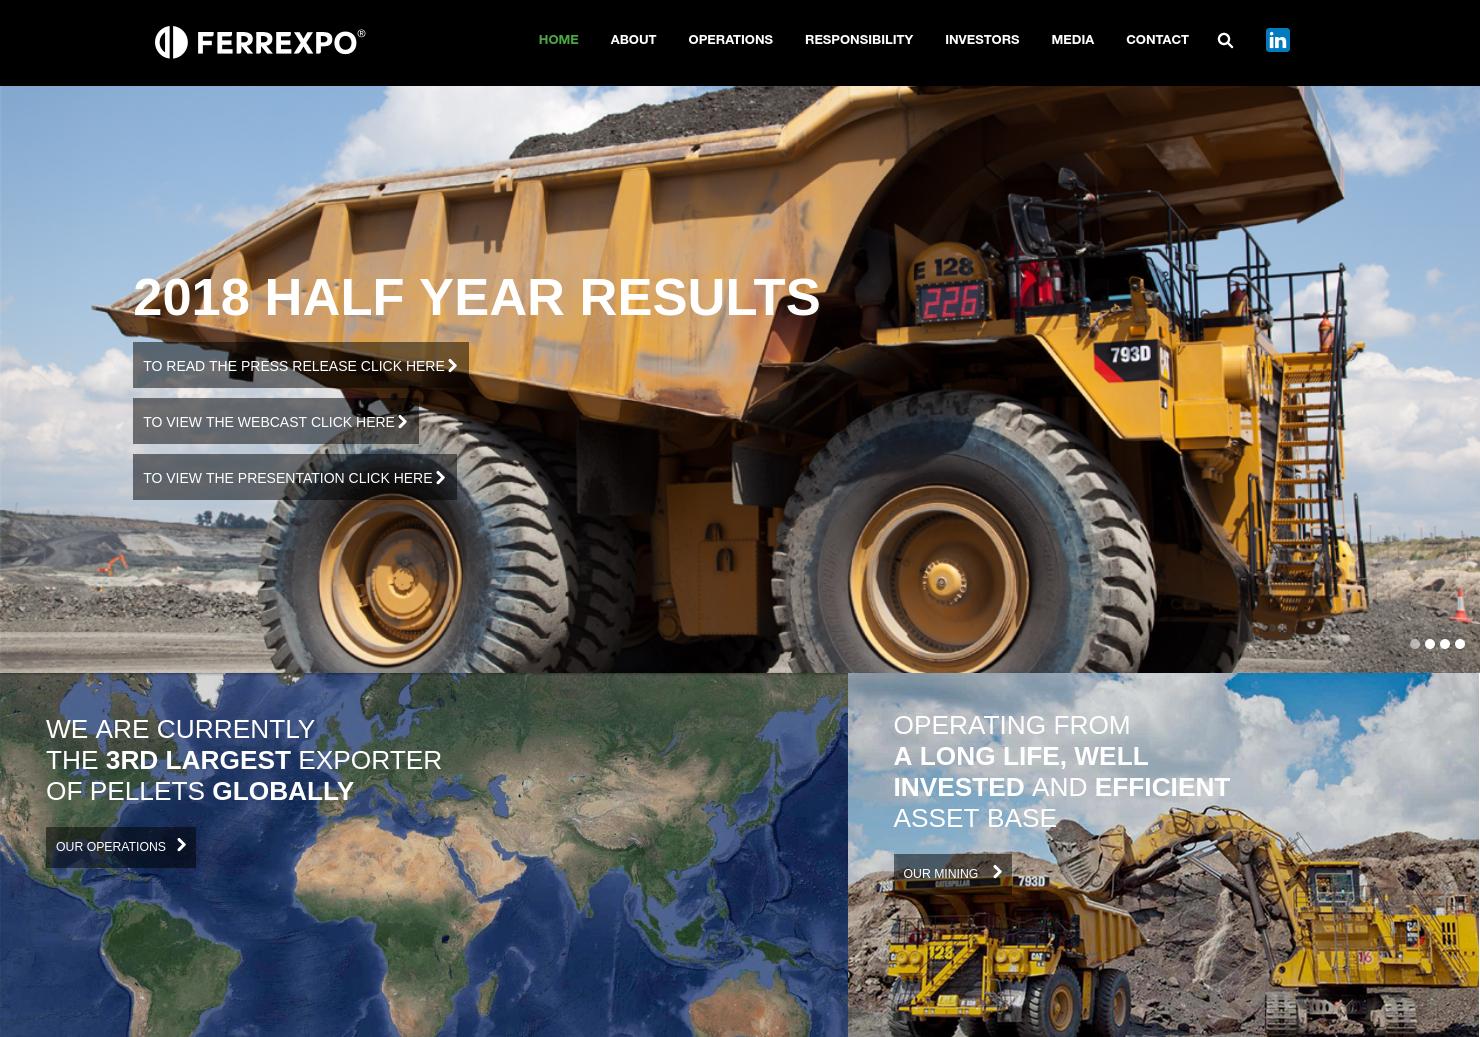 Ferrexpo Home Page